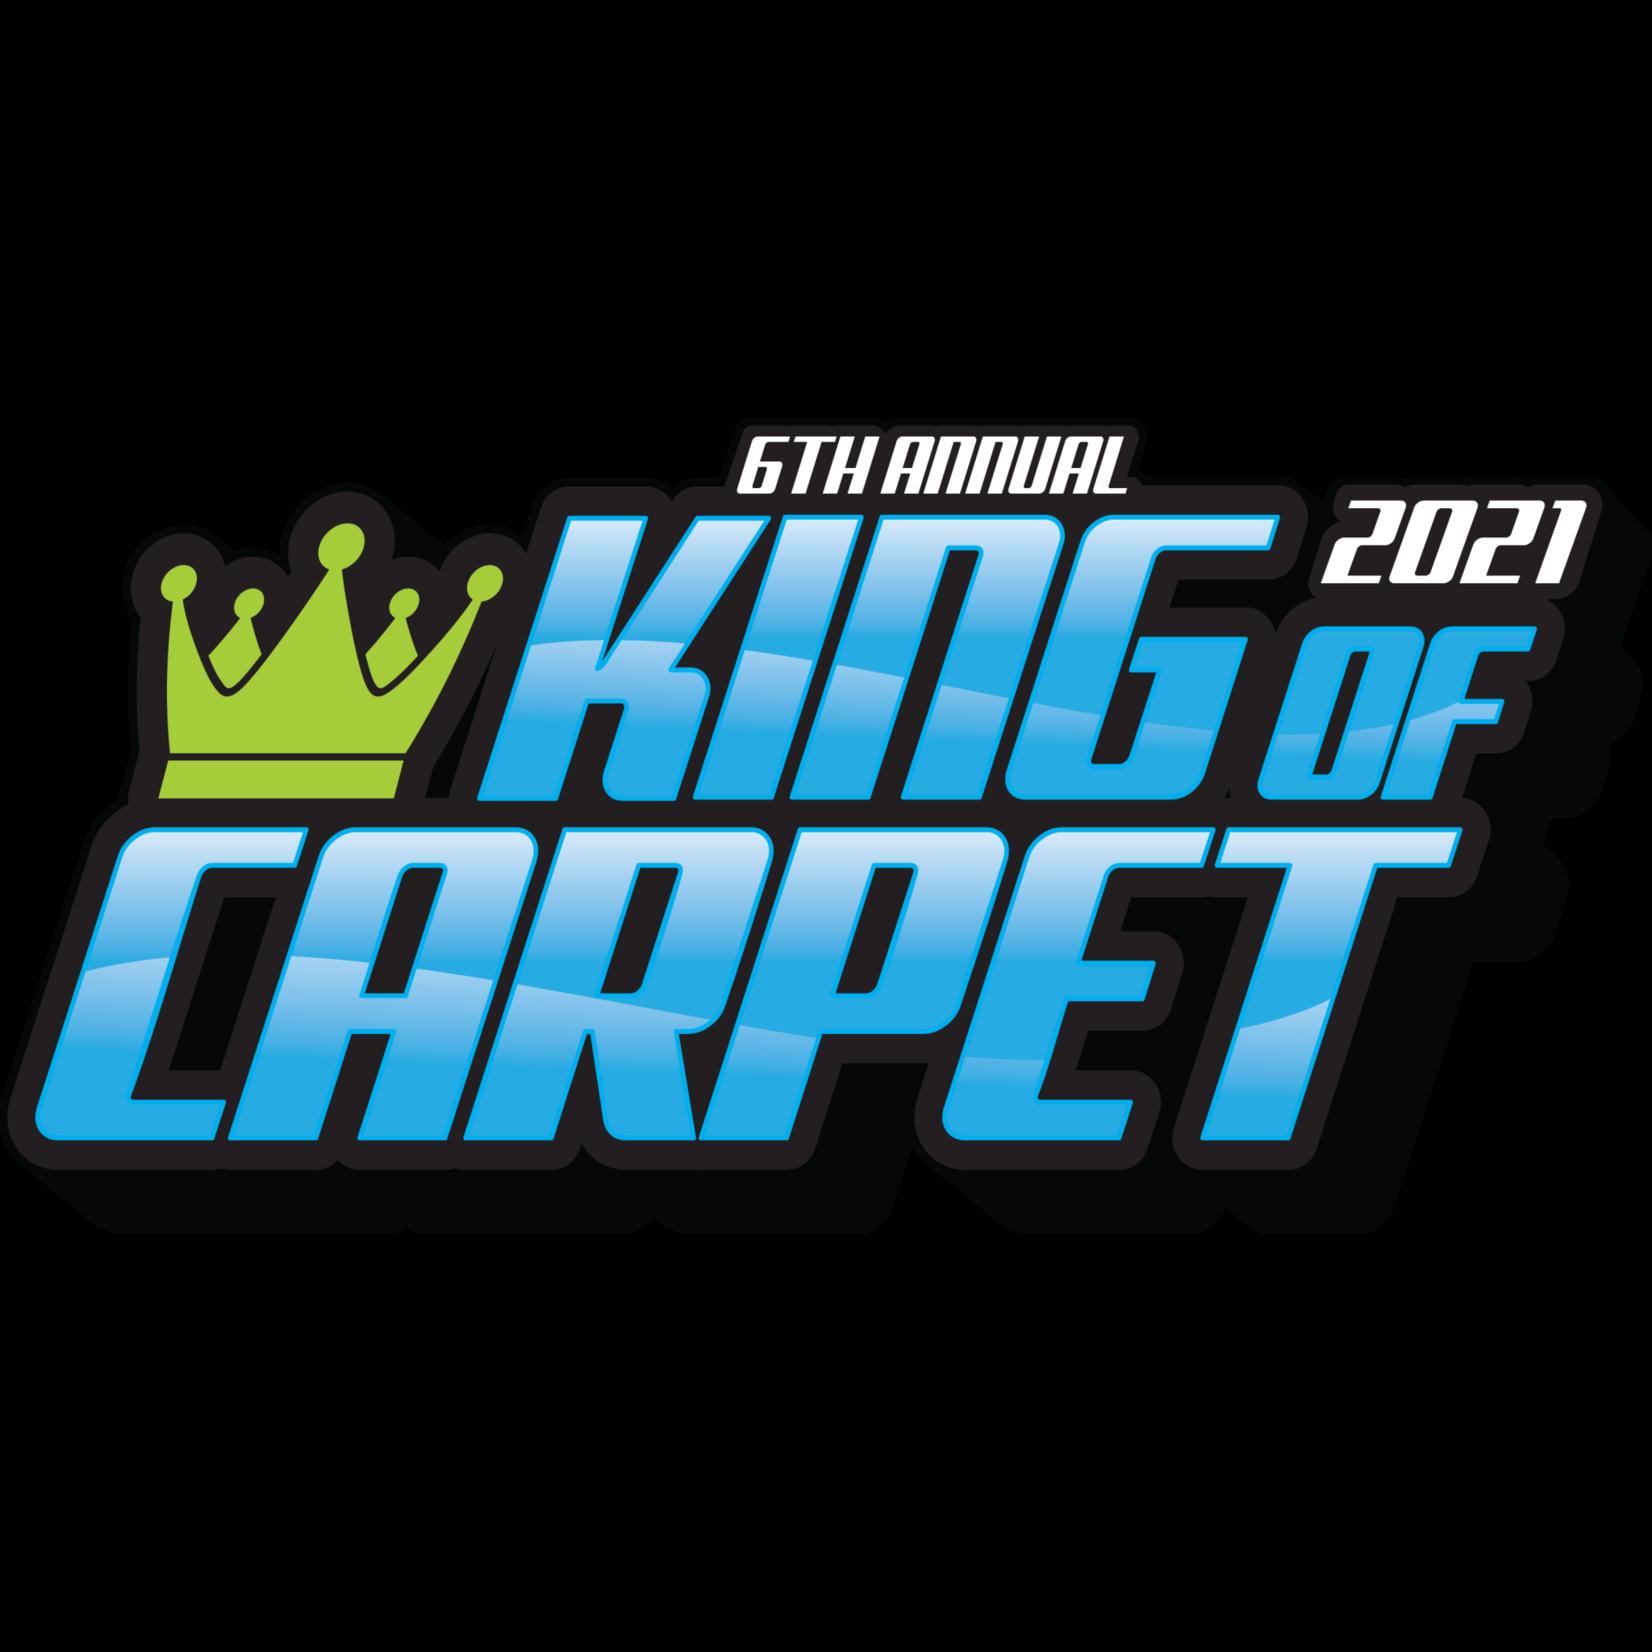 2nd Class (King of Carpet)